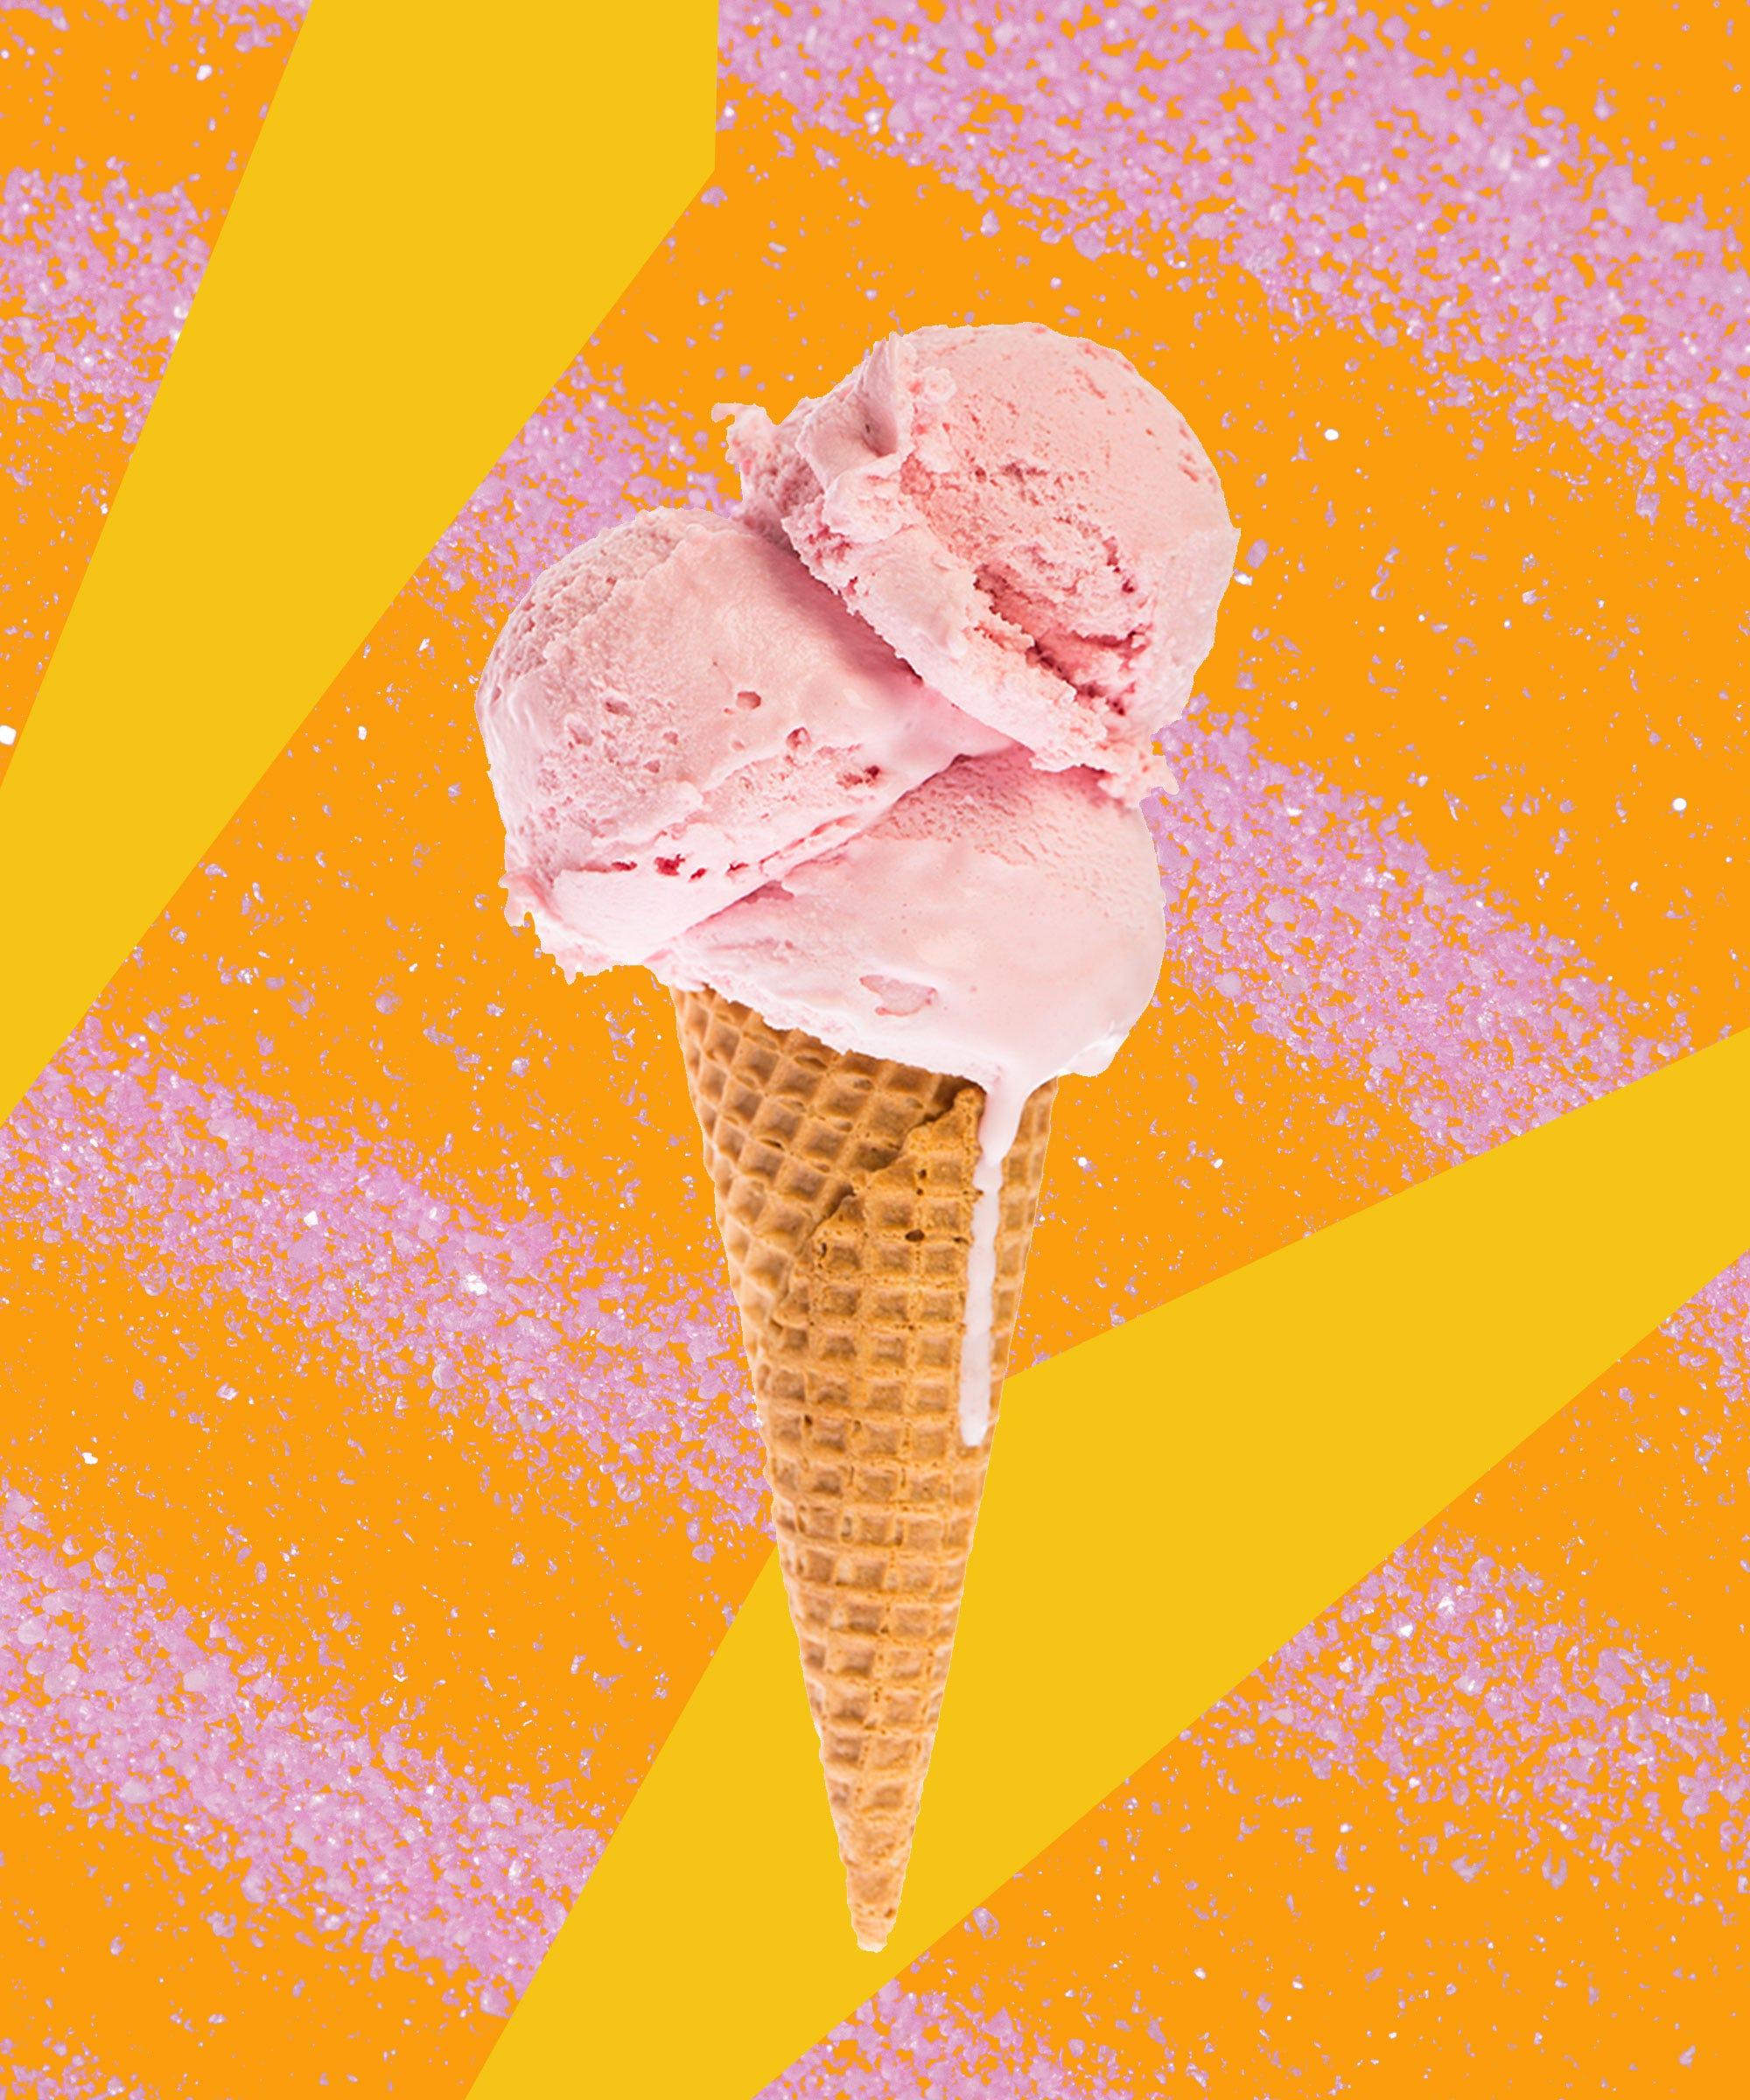 How To Get Free Ben & Jerry's Ice Cream Today